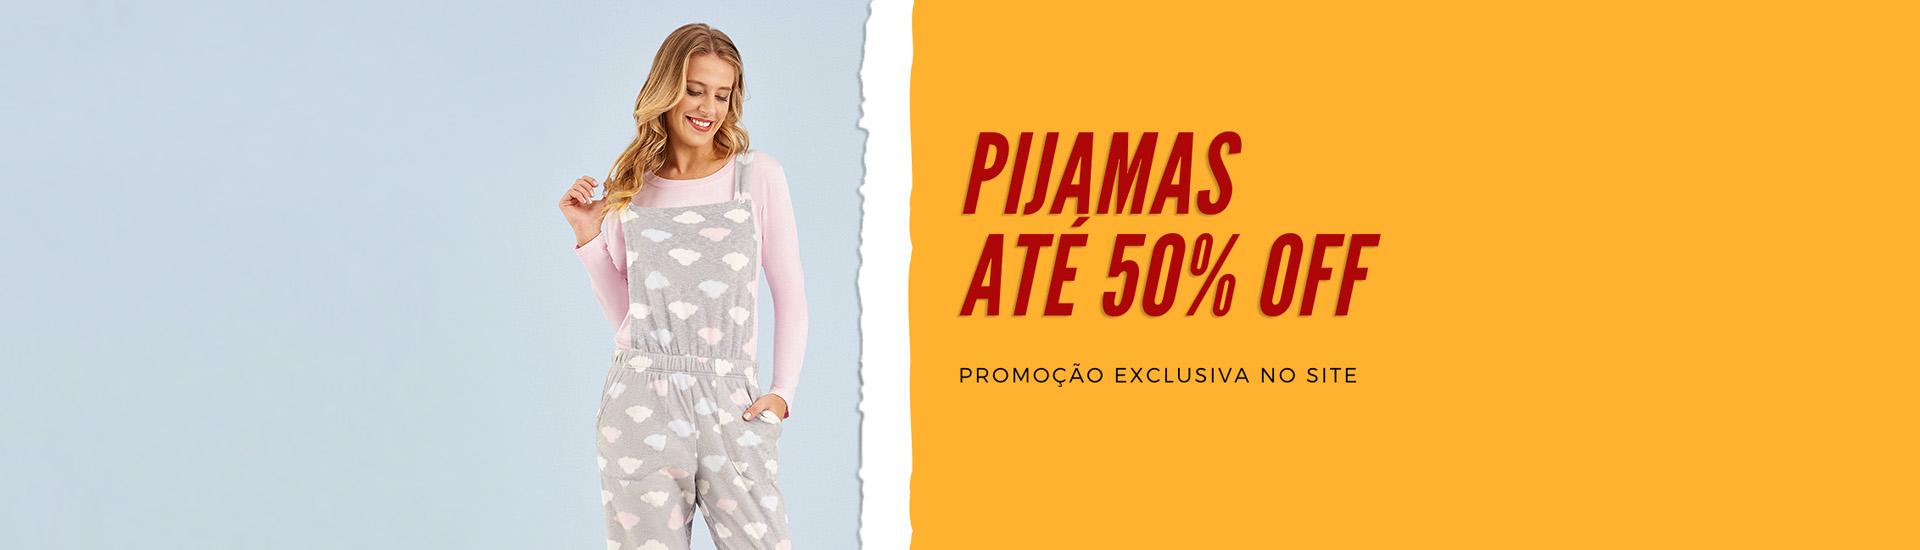 Pijamas até 50 OFF 2